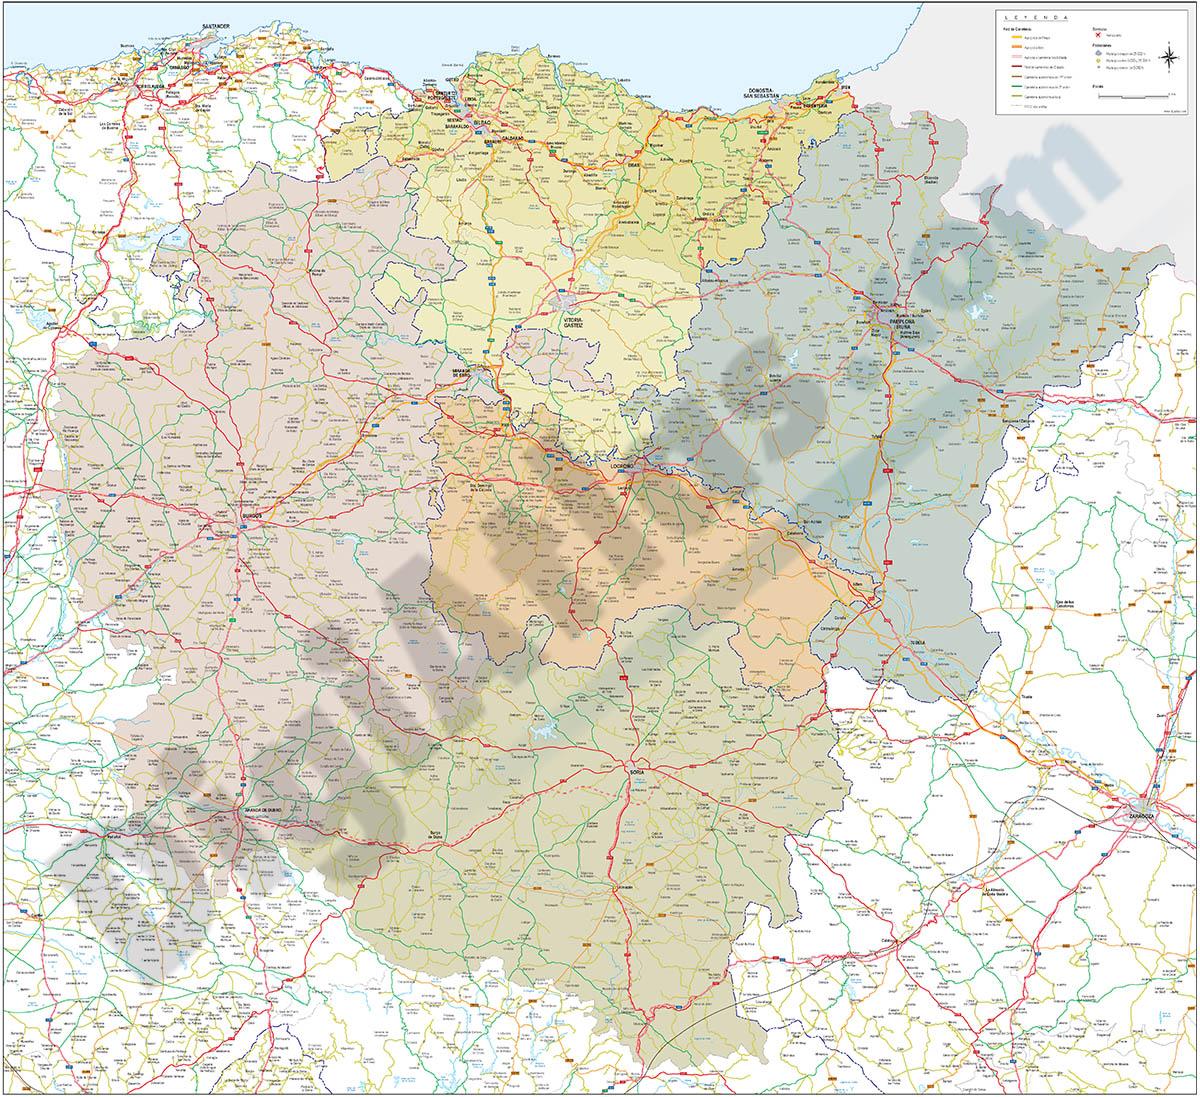 Map of Basque Country, Navarra, La Rioja, Burgos and Soria